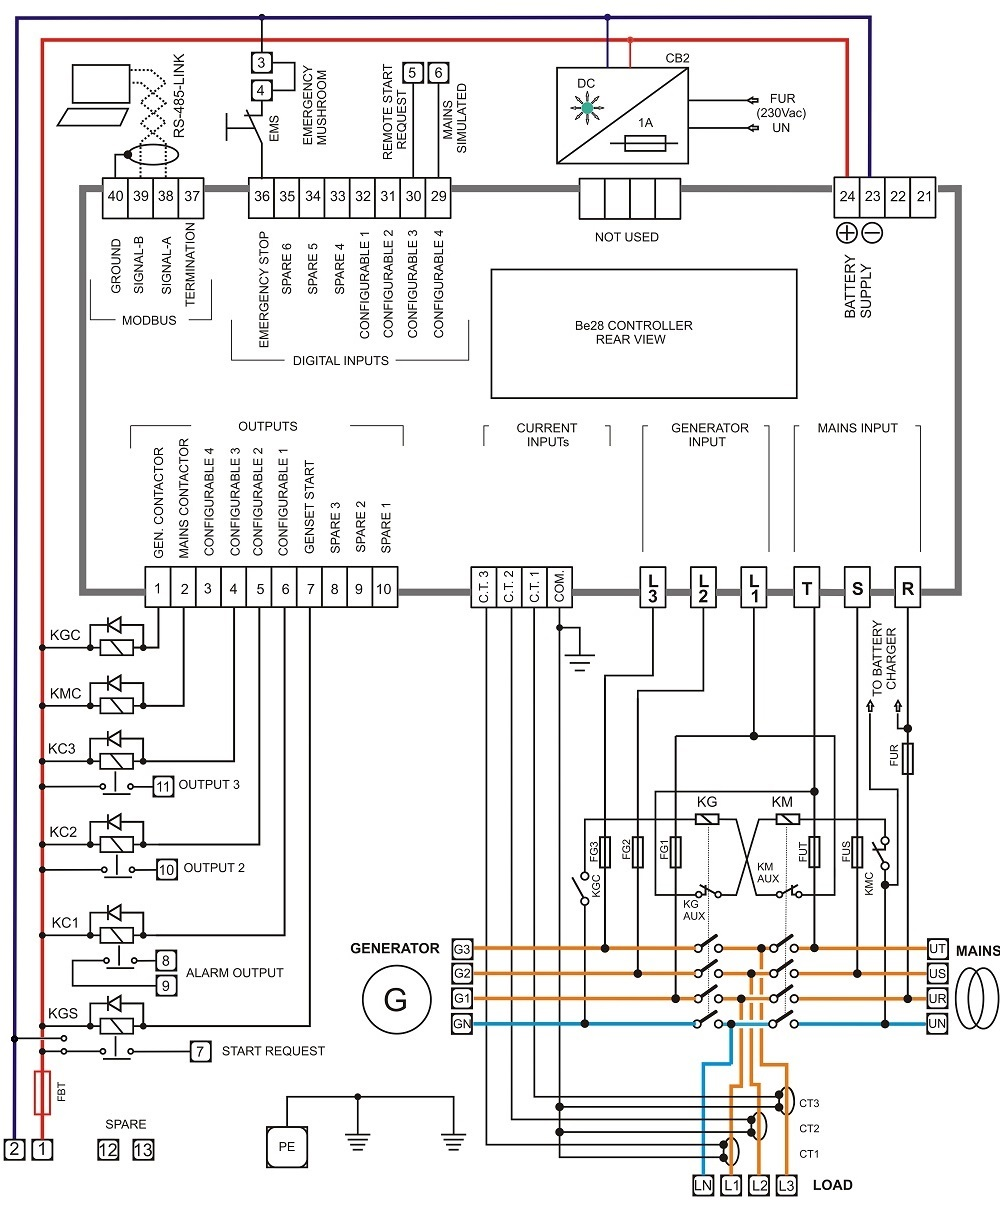 Citroen C3 Electrical Wiring Diagram Autoloc Diagrams Svpro5 Magnificent Gallery Design